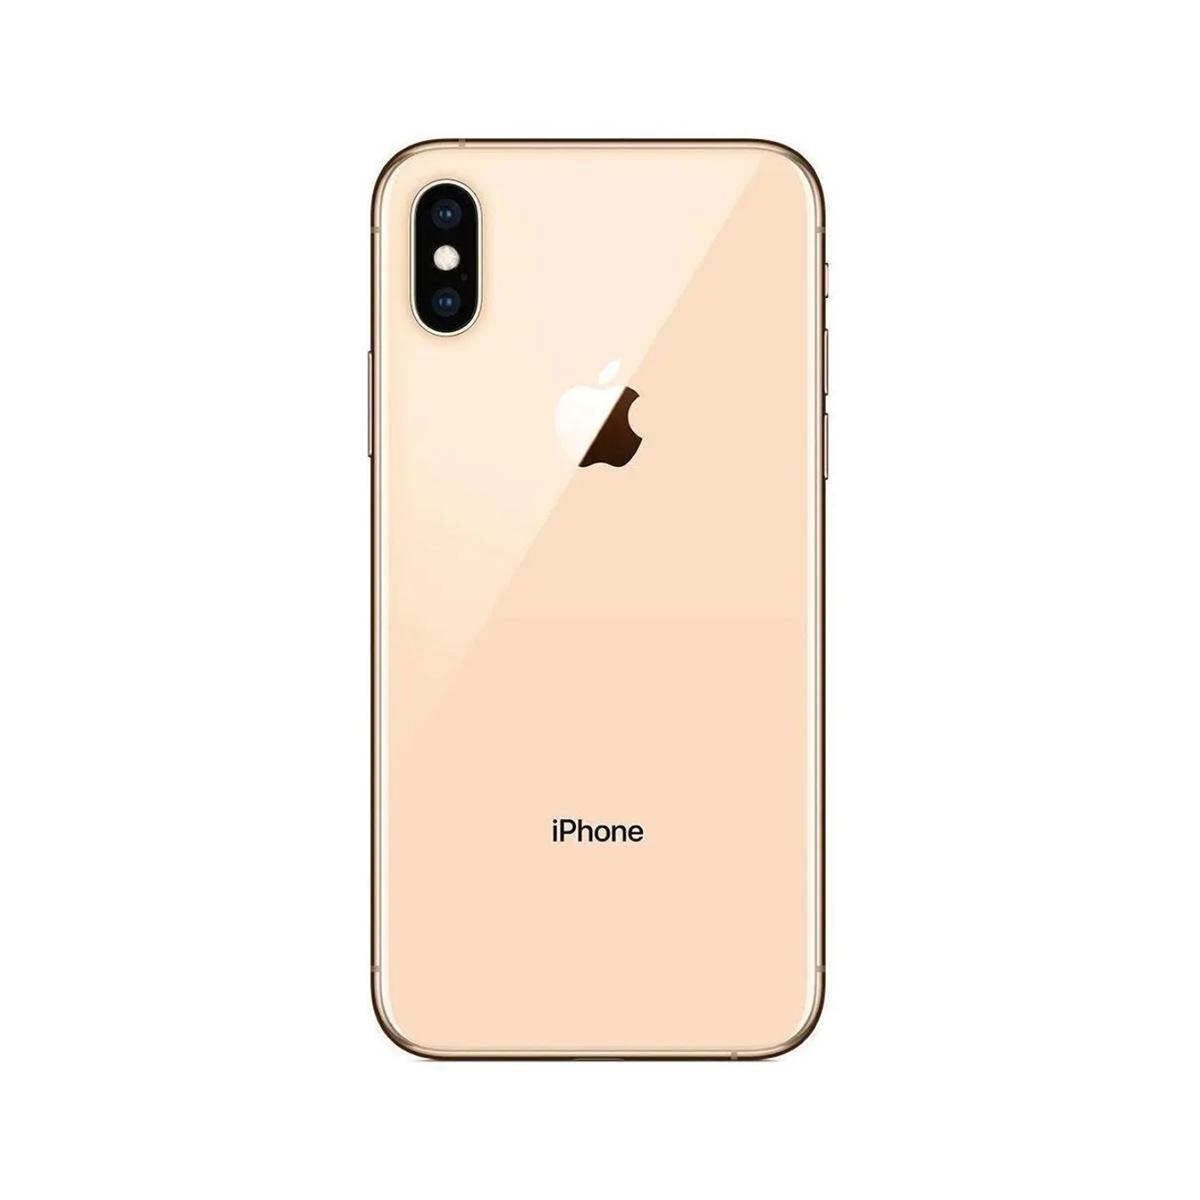 Apple iPhone XS 256gb Tela 5.8' 12mp Original - Mostruário